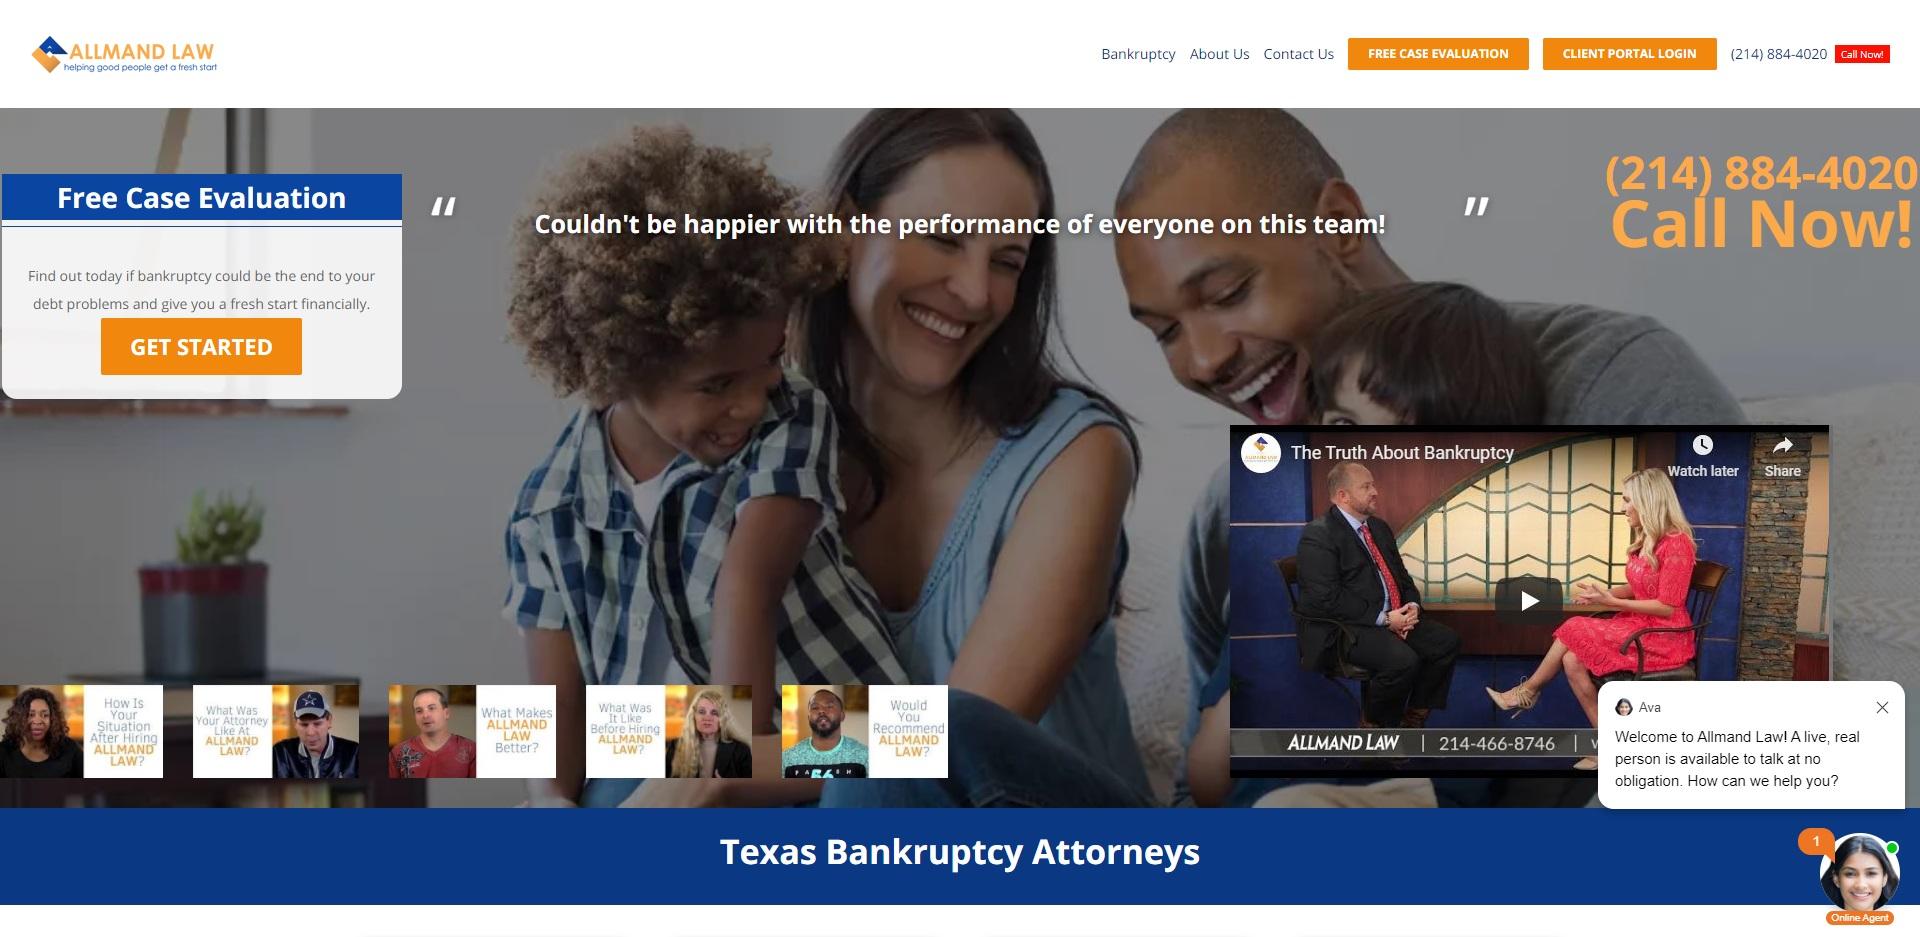 Dallas Best Bankruptcy Attorneys